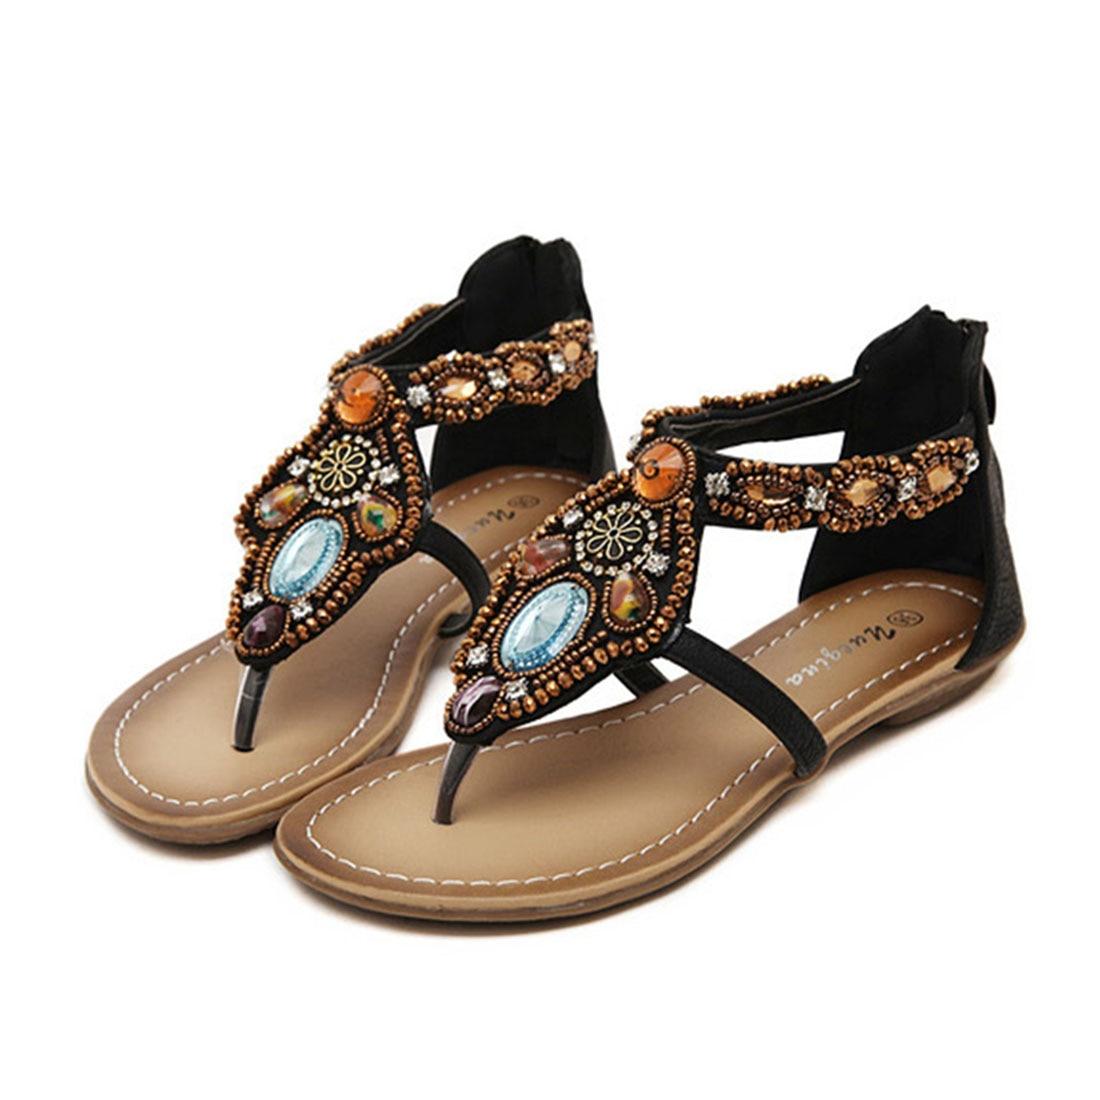 https://ae01.alicdn.com/kf/HTB1cxQwQFXXXXbHXXXXq6xXFXXXR/Free-shipping-2017-women-Flat-Sandals-Ankle-Fashion-ethnic-trend-Sandals-Bohemia-Beaded-sandals-womens-flip.jpg